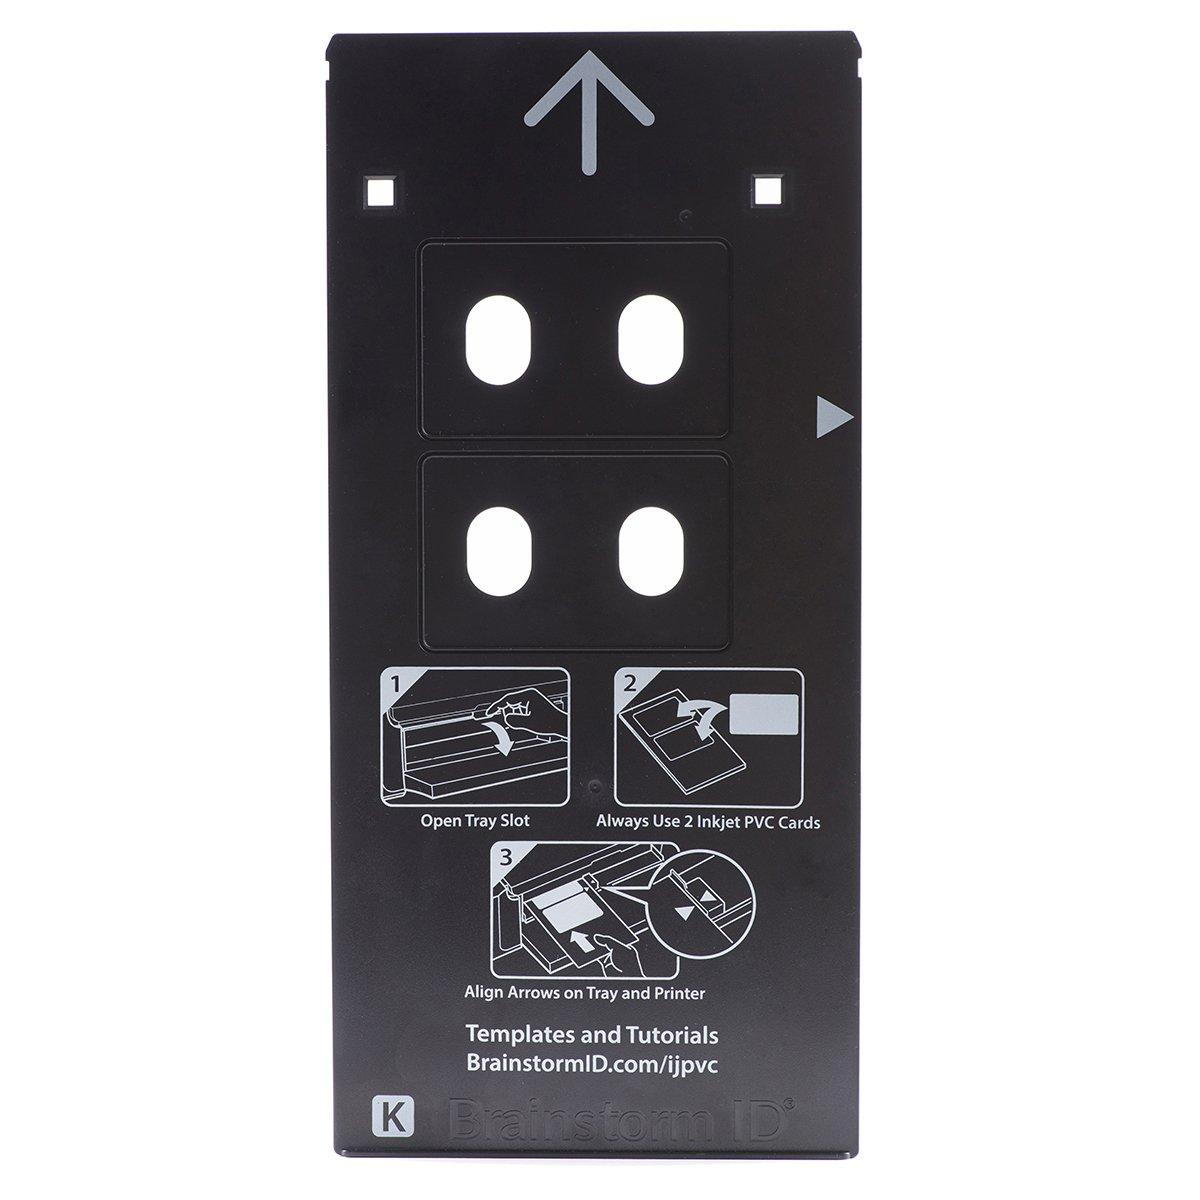 Inkjet PVC Card Tray for Canon PIXMA PRO-10 and PRO-100 (Canon K Tray Printers) Brainstorm ID 4328392369